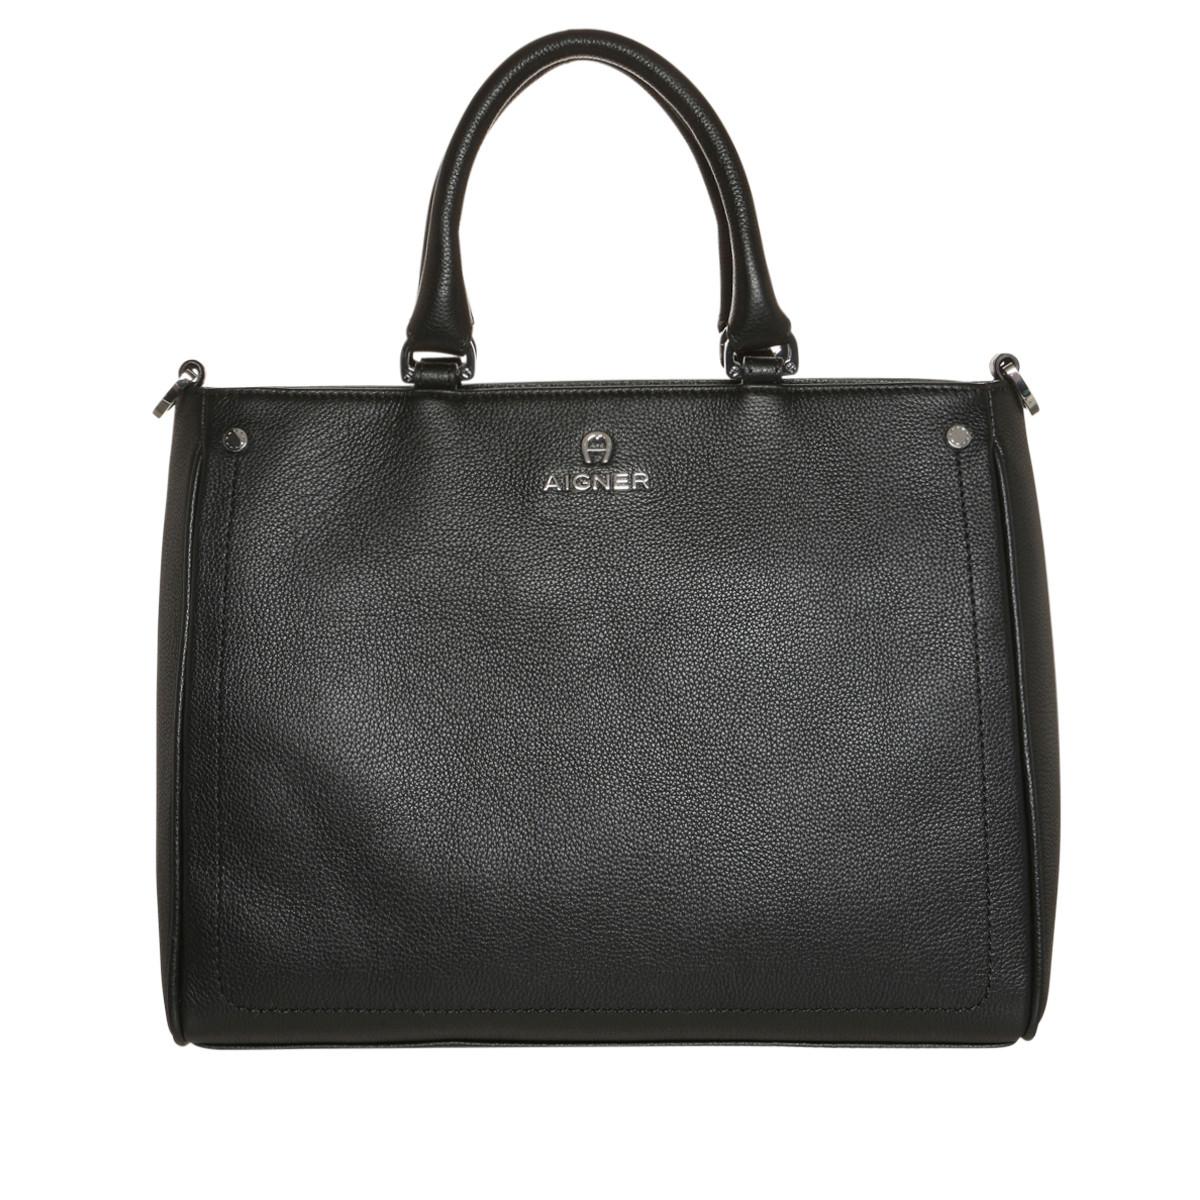 Aigner Tote - Ava Handle Bag Medium Black - in schwarz - für Damen